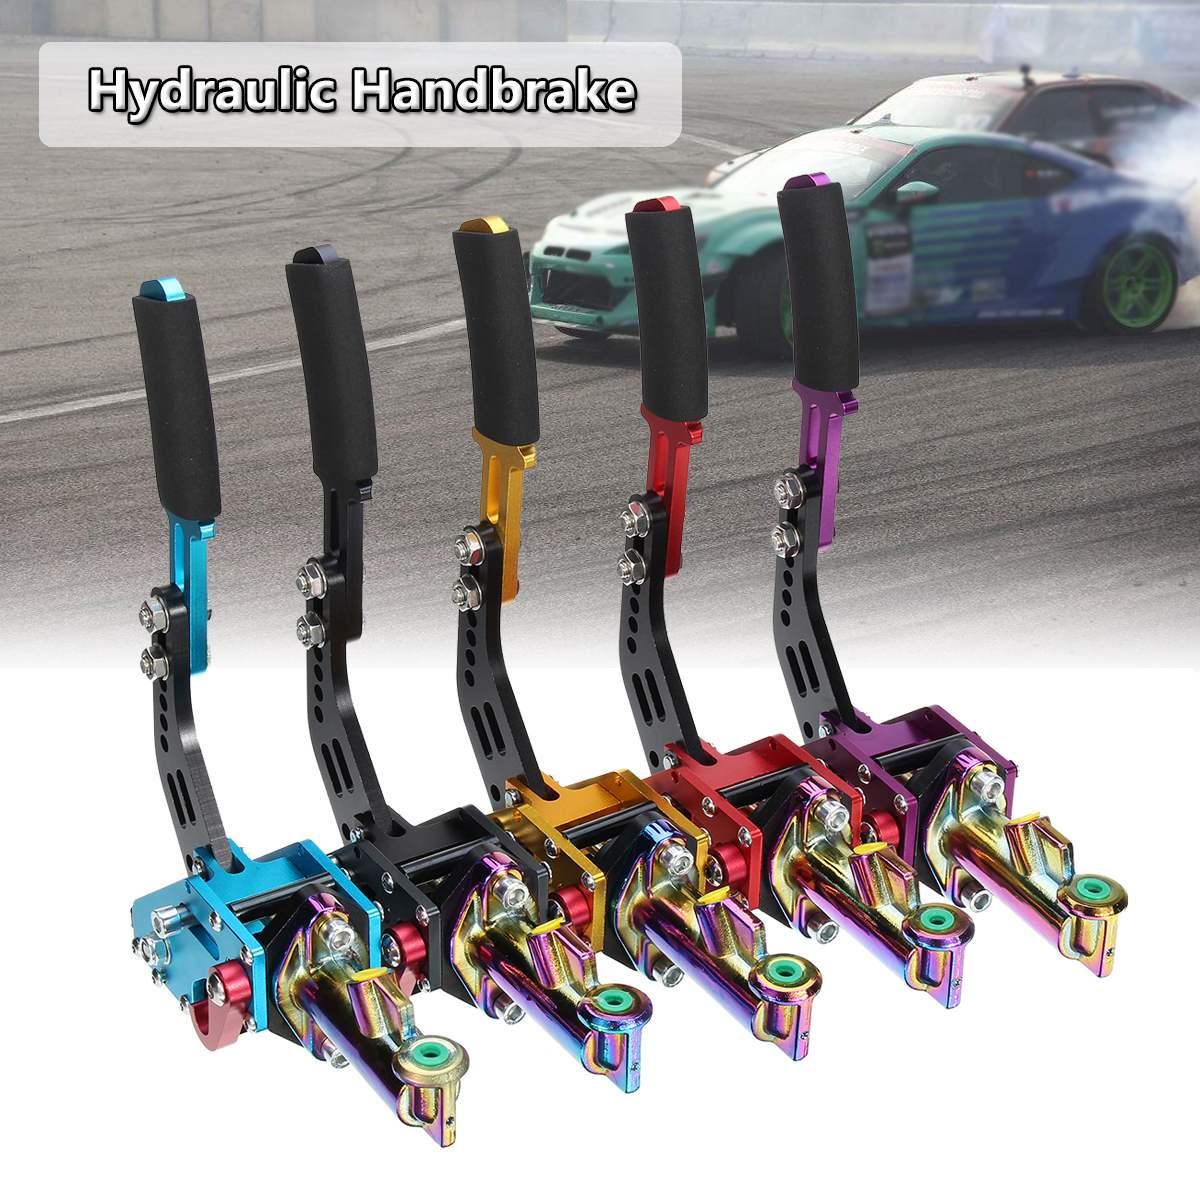 цена Universal Vertical Racing Escort Rally E-Brake Drift Hydraulic Handbrake Hydro в интернет-магазинах